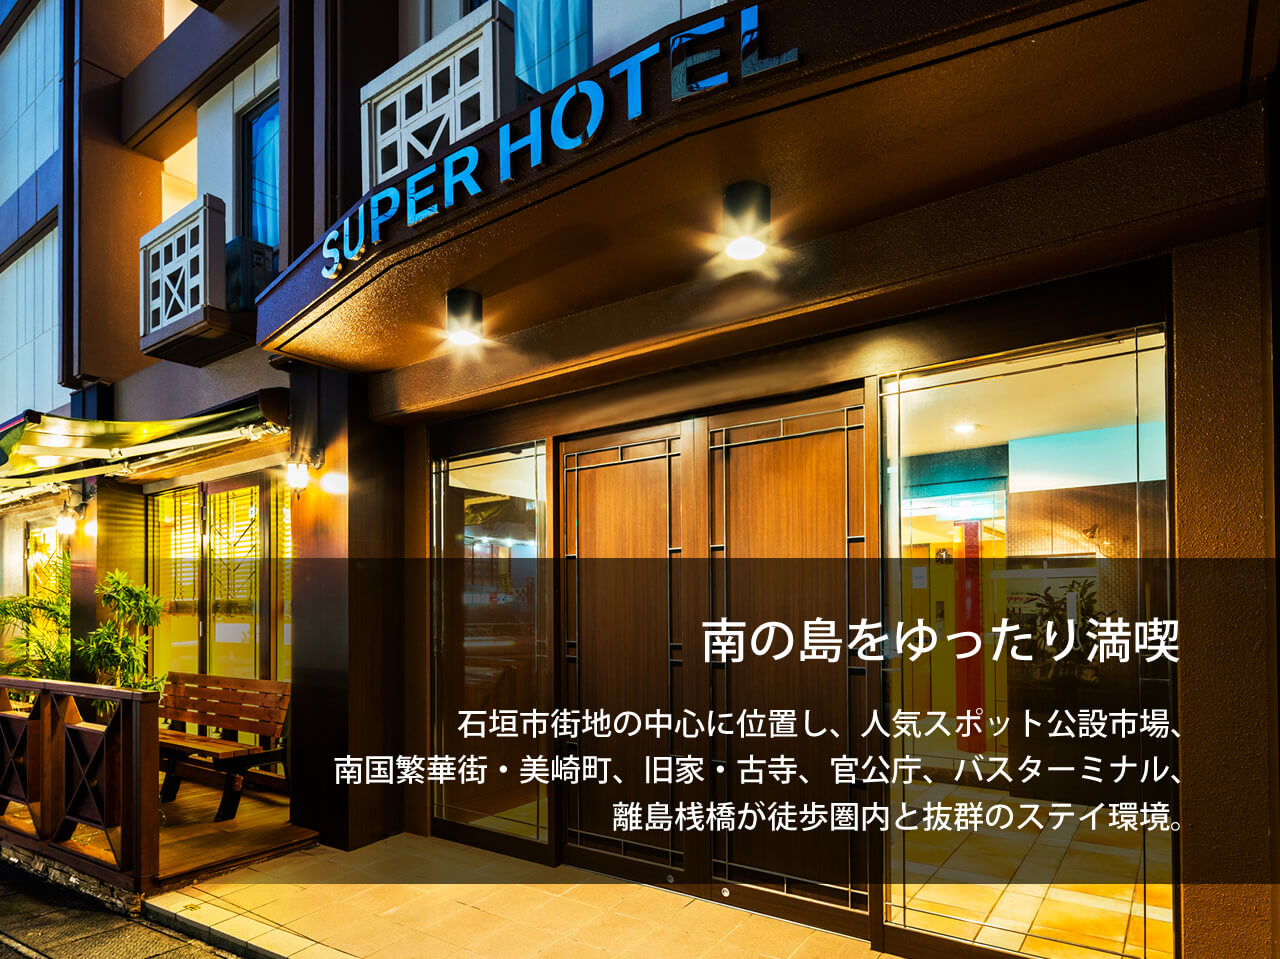 Super Hotel Ishigakijima